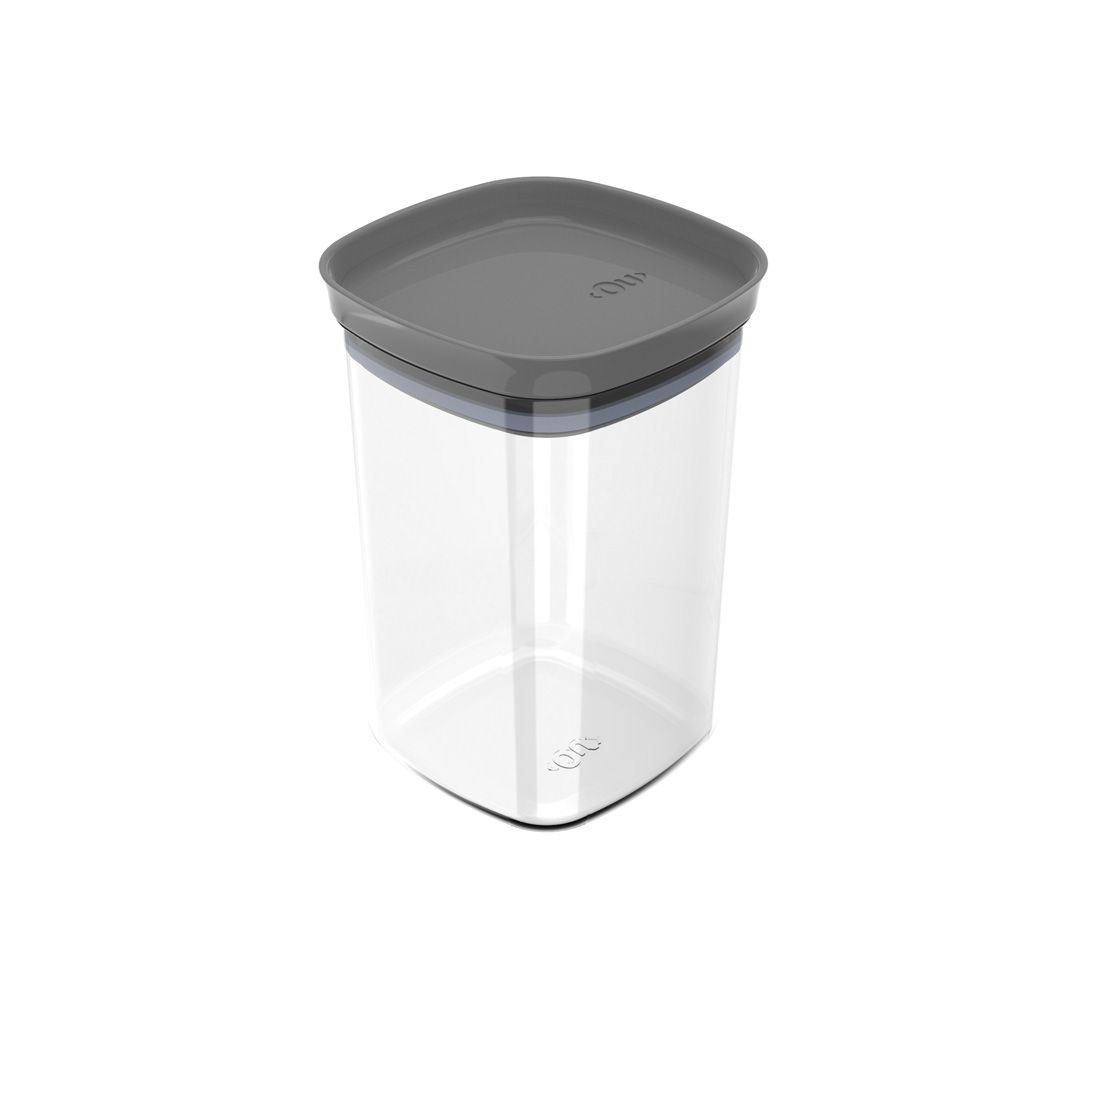 Pote de Plástico com Tampa Hermética Block 1L Chumbo